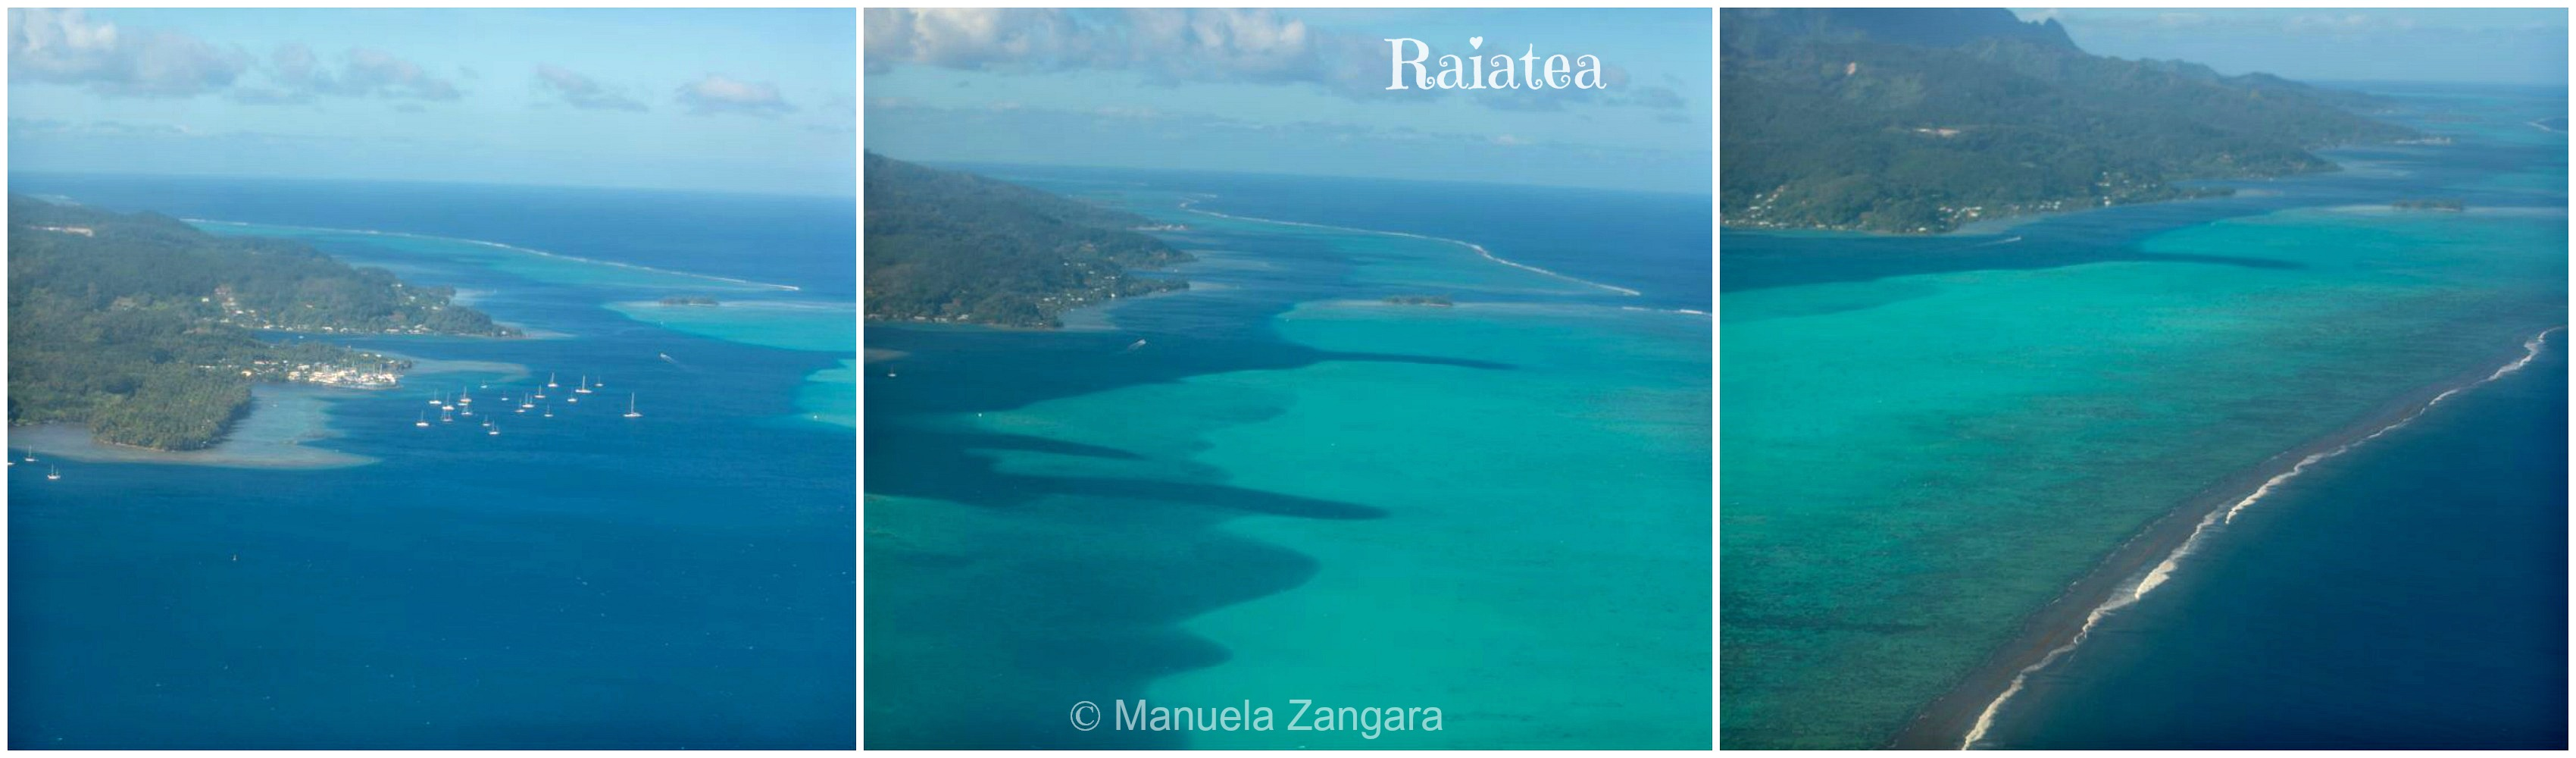 Raiatea from plane